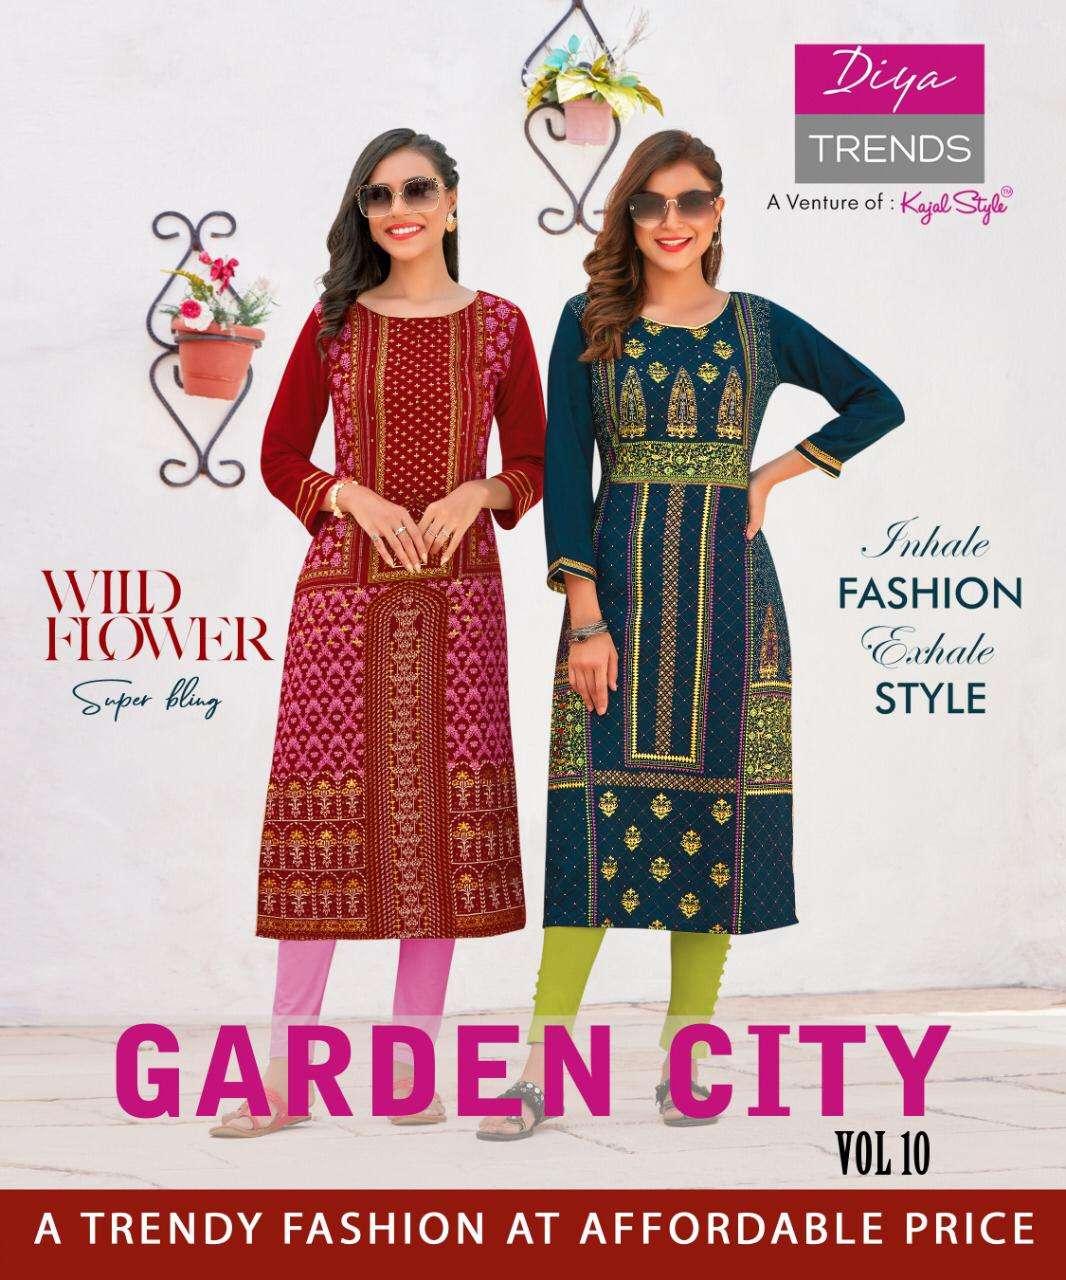 Diya Trends Garden City Vol 10 Rayon With Foil Print Regular Wear Kurtis collection